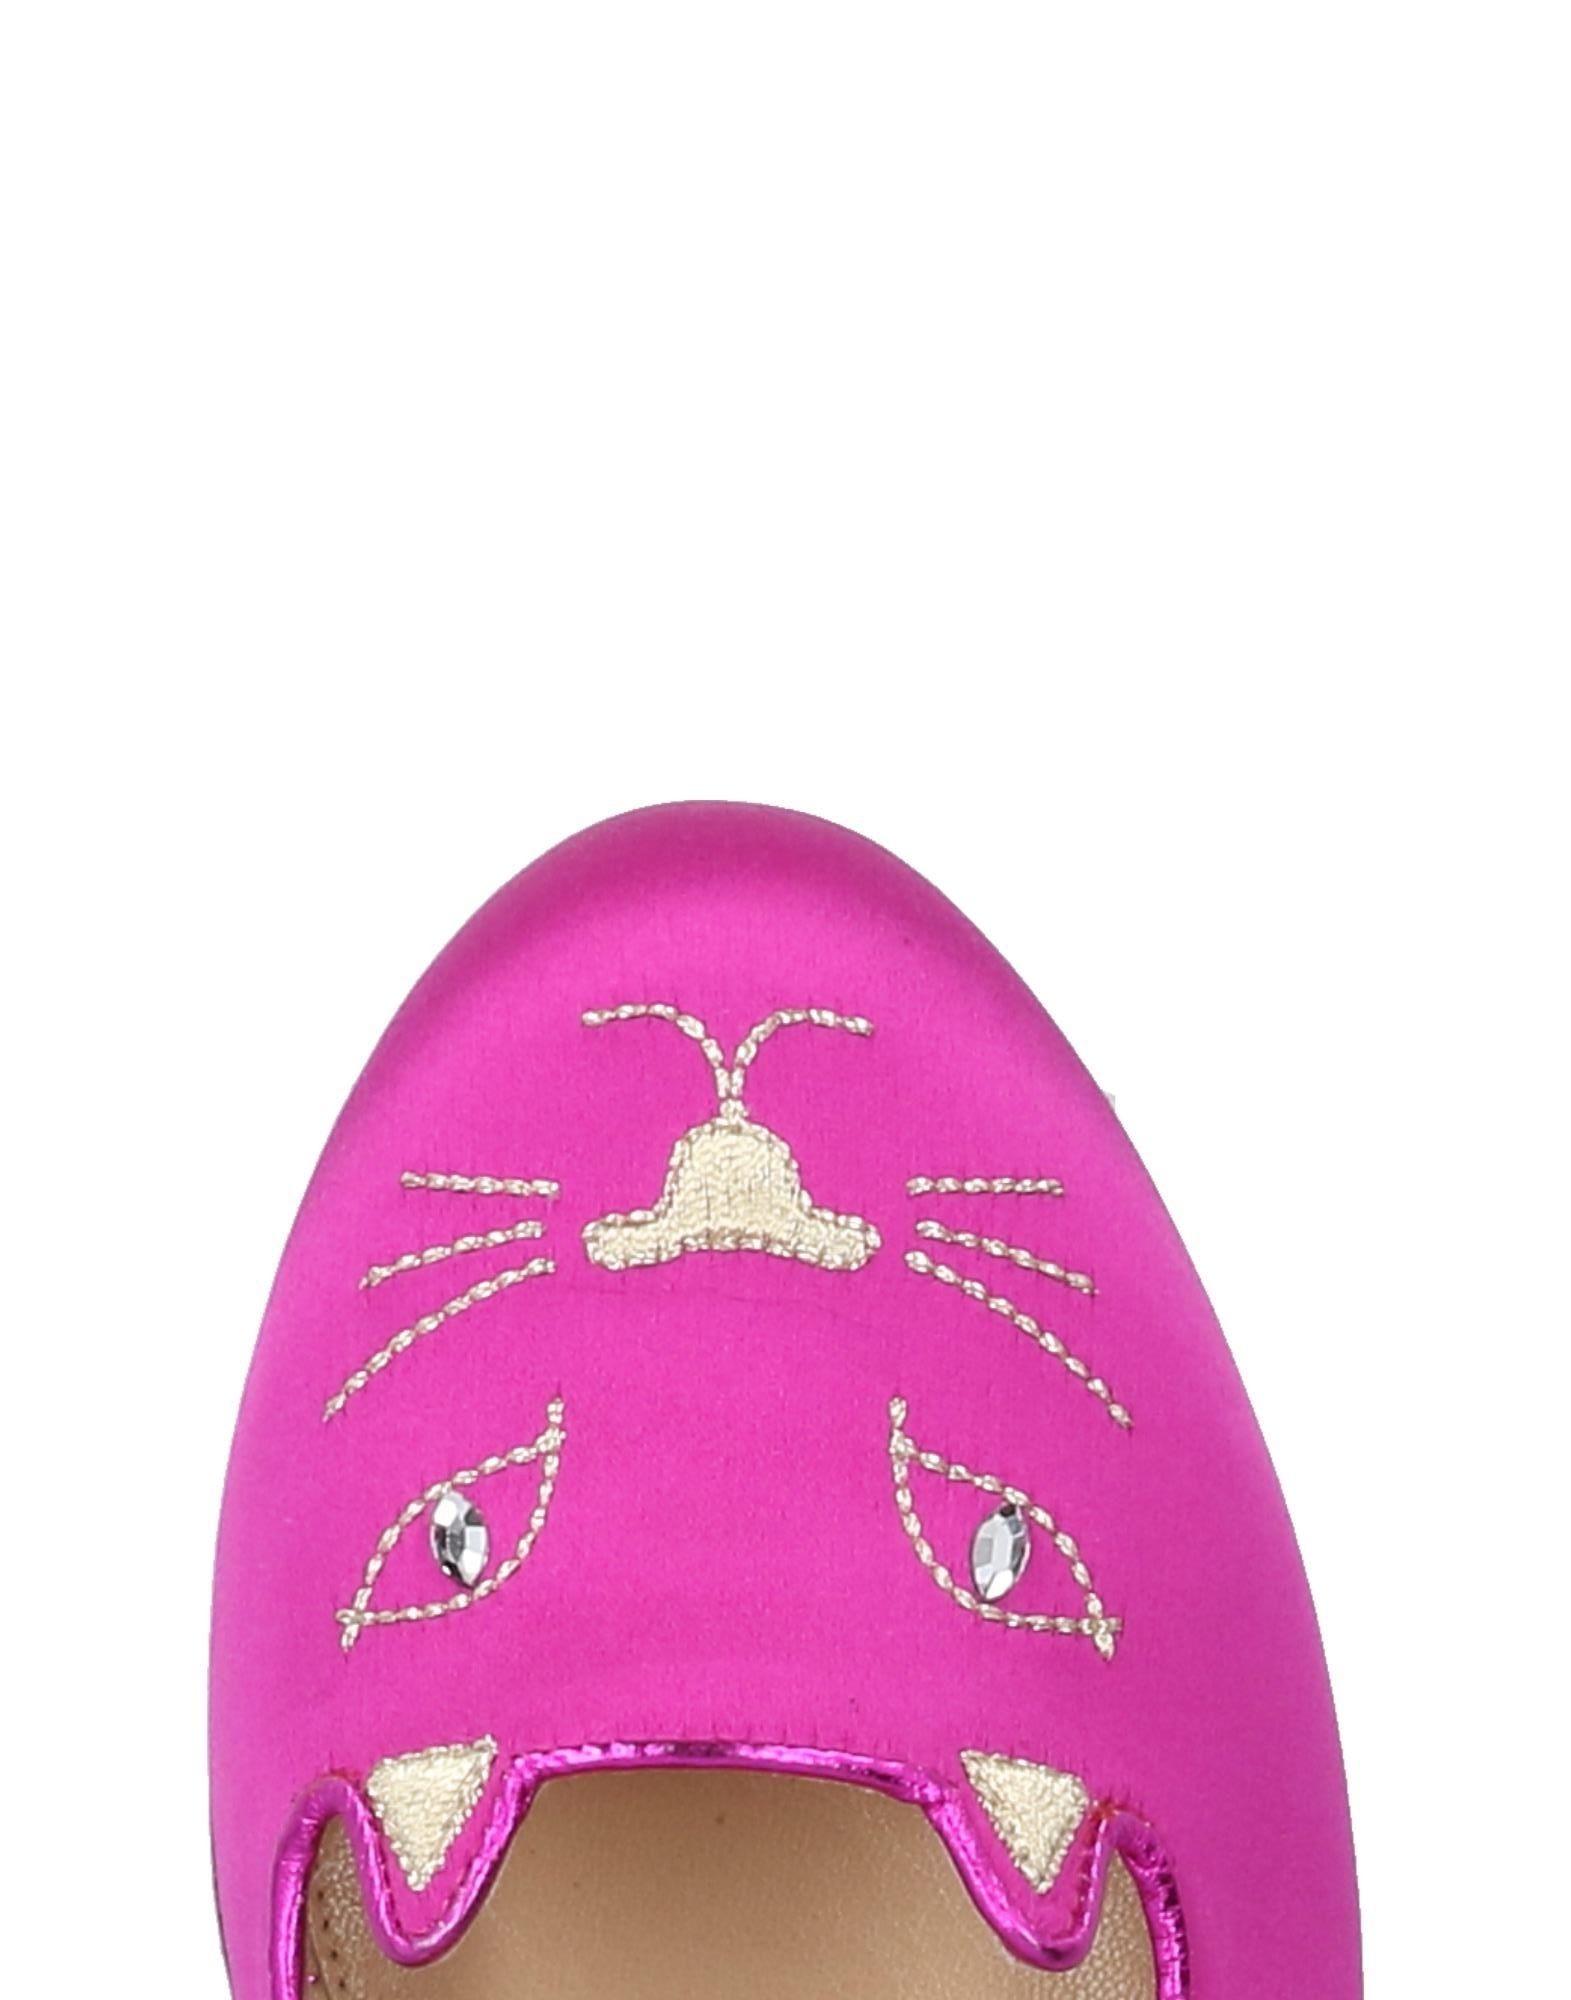 Charlotte Olympia Mokassins Damen  11487407CPGut aussehende strapazierfähige Schuhe